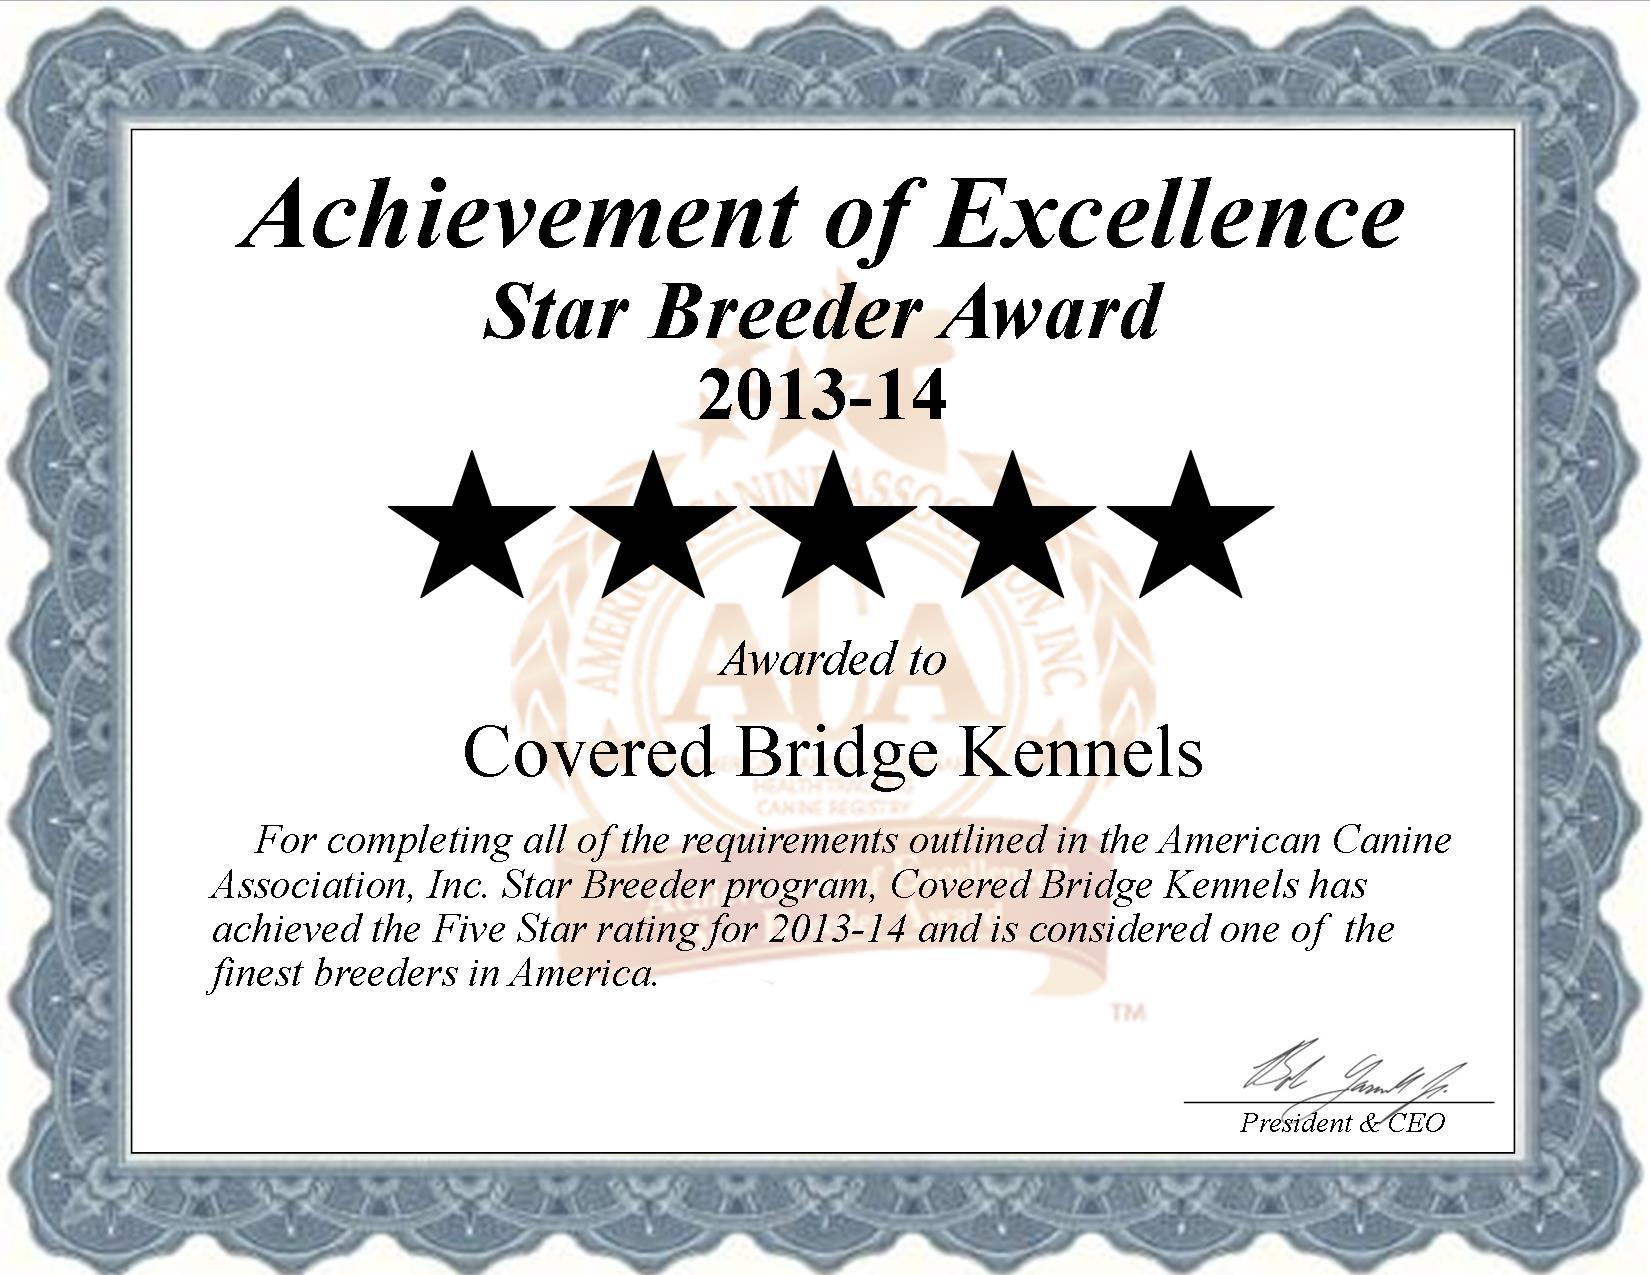 Covered Bridge Kennel, weaverland, Covered Bridge, crestwod, East Earl, PA, Pennsylvania, breeder, star breeder, starbreeder, 5 star, dog, puppy, puppies, five star